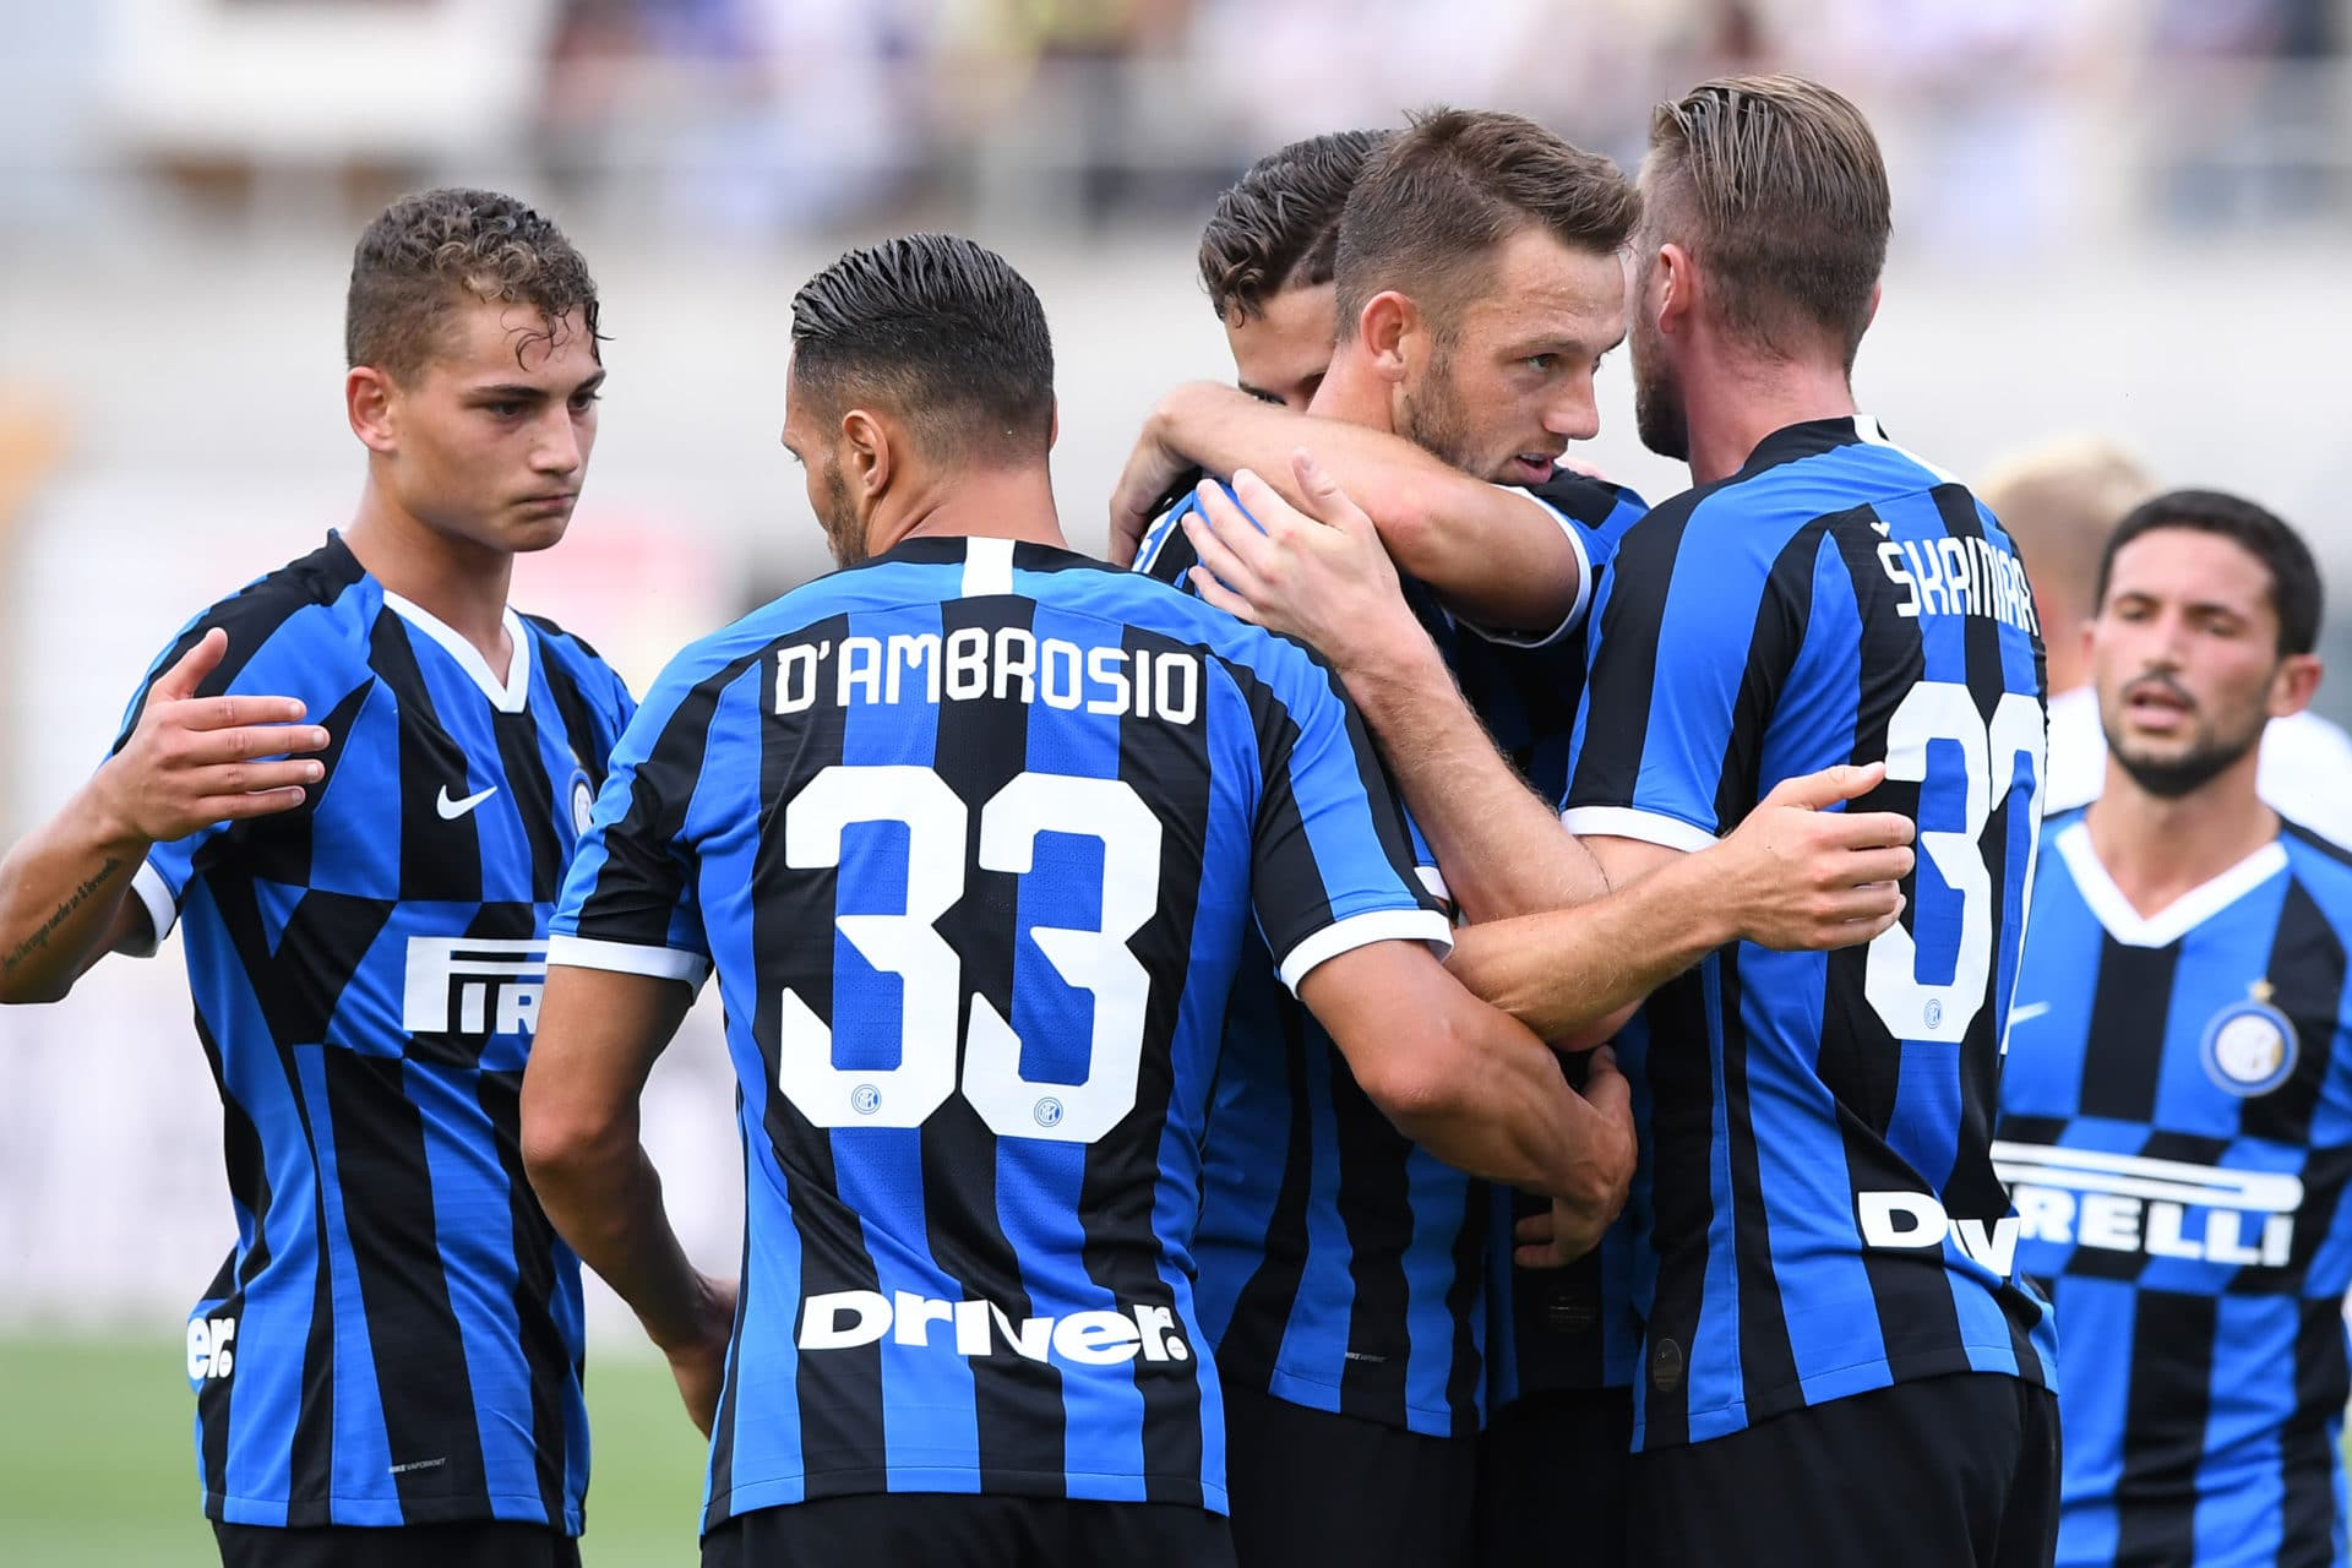 Calendario Inter Champions.Calendario Inter Gironi Champions League 2019 2020 Date E